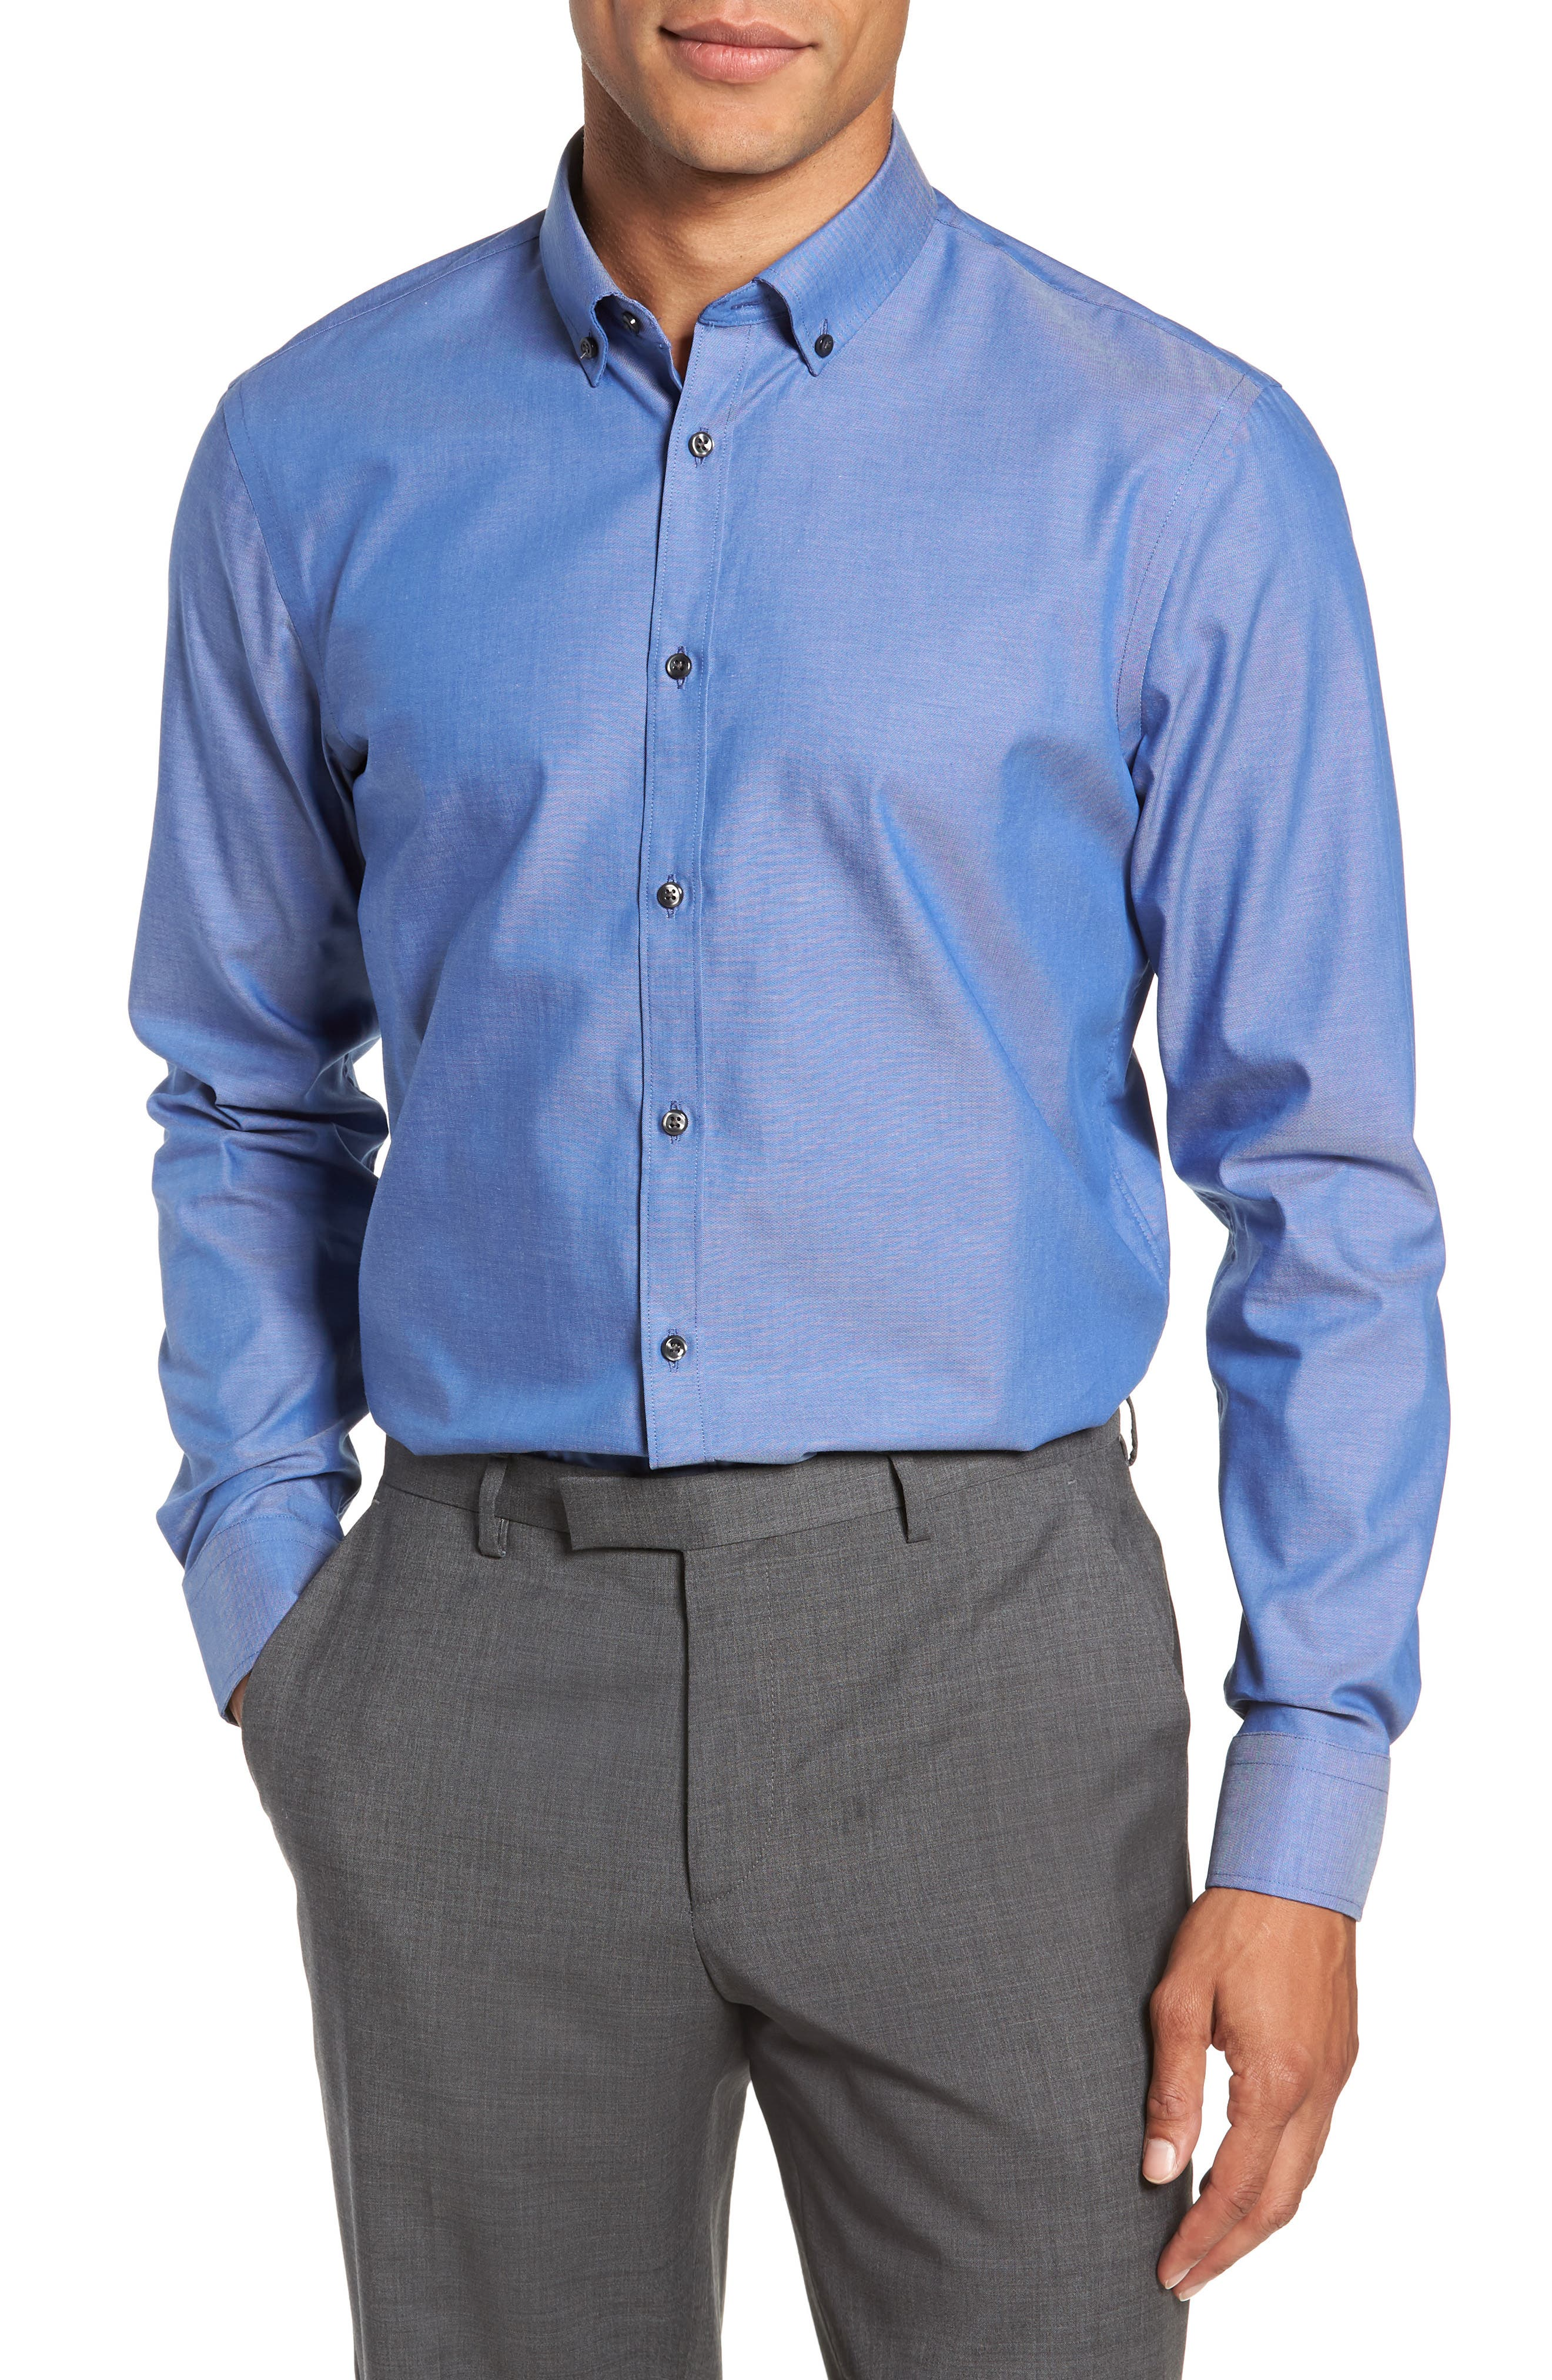 Extra Trim Fit Non-Iron Dress Shirt,                             Main thumbnail 1, color,                             420